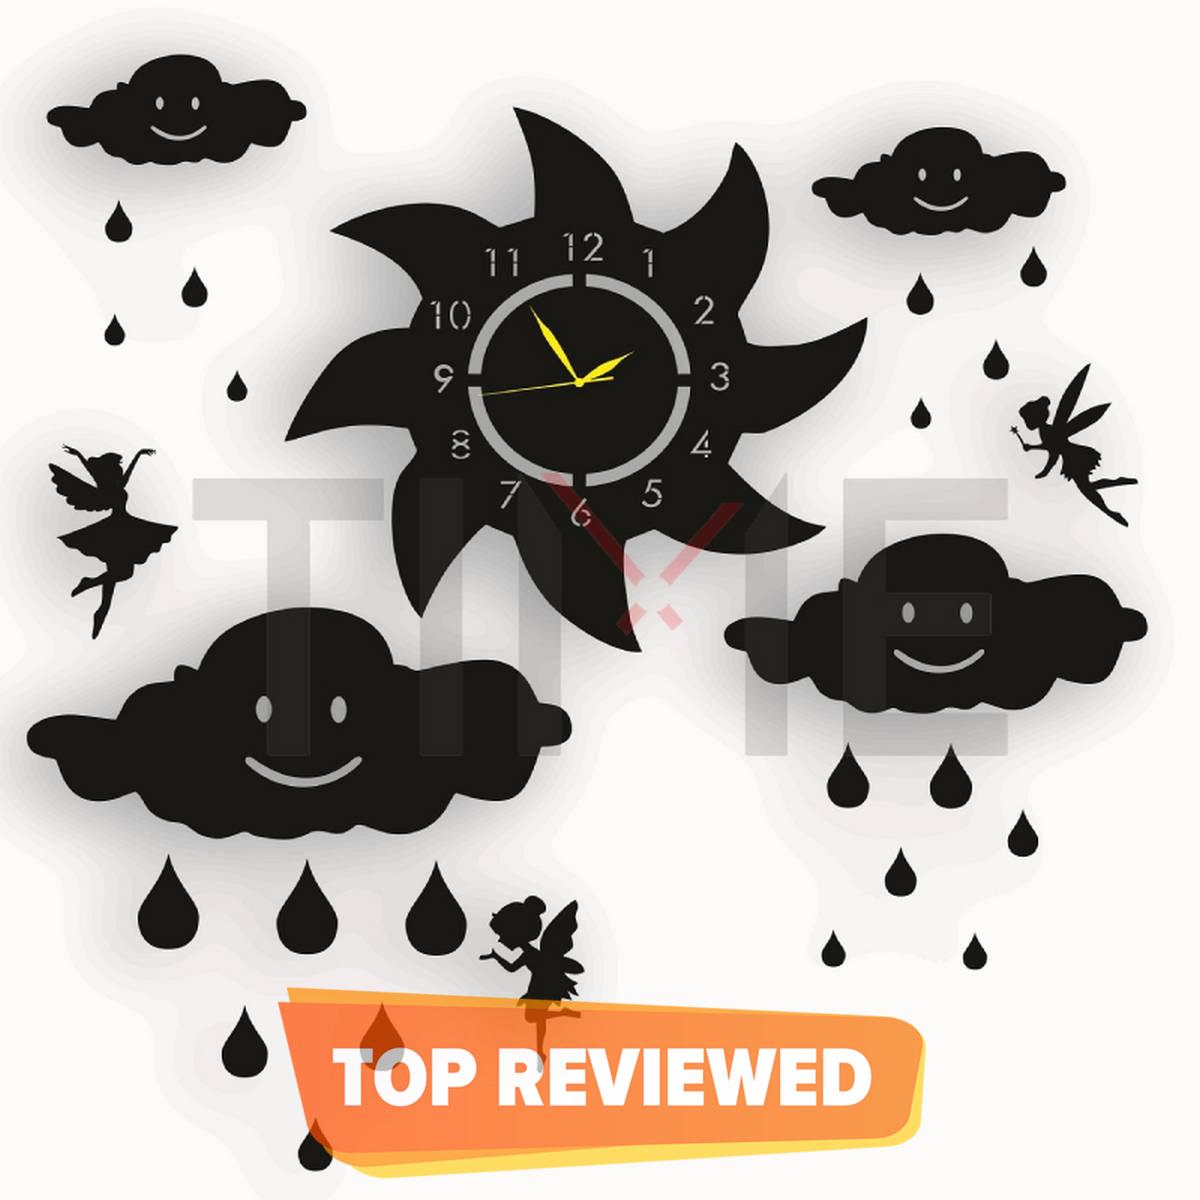 Special design top quality modern wall clock decorative fairy wall clock with Clouds & Rain Drops & Sun, Girls Room 3D Laser Cut Wall Clock